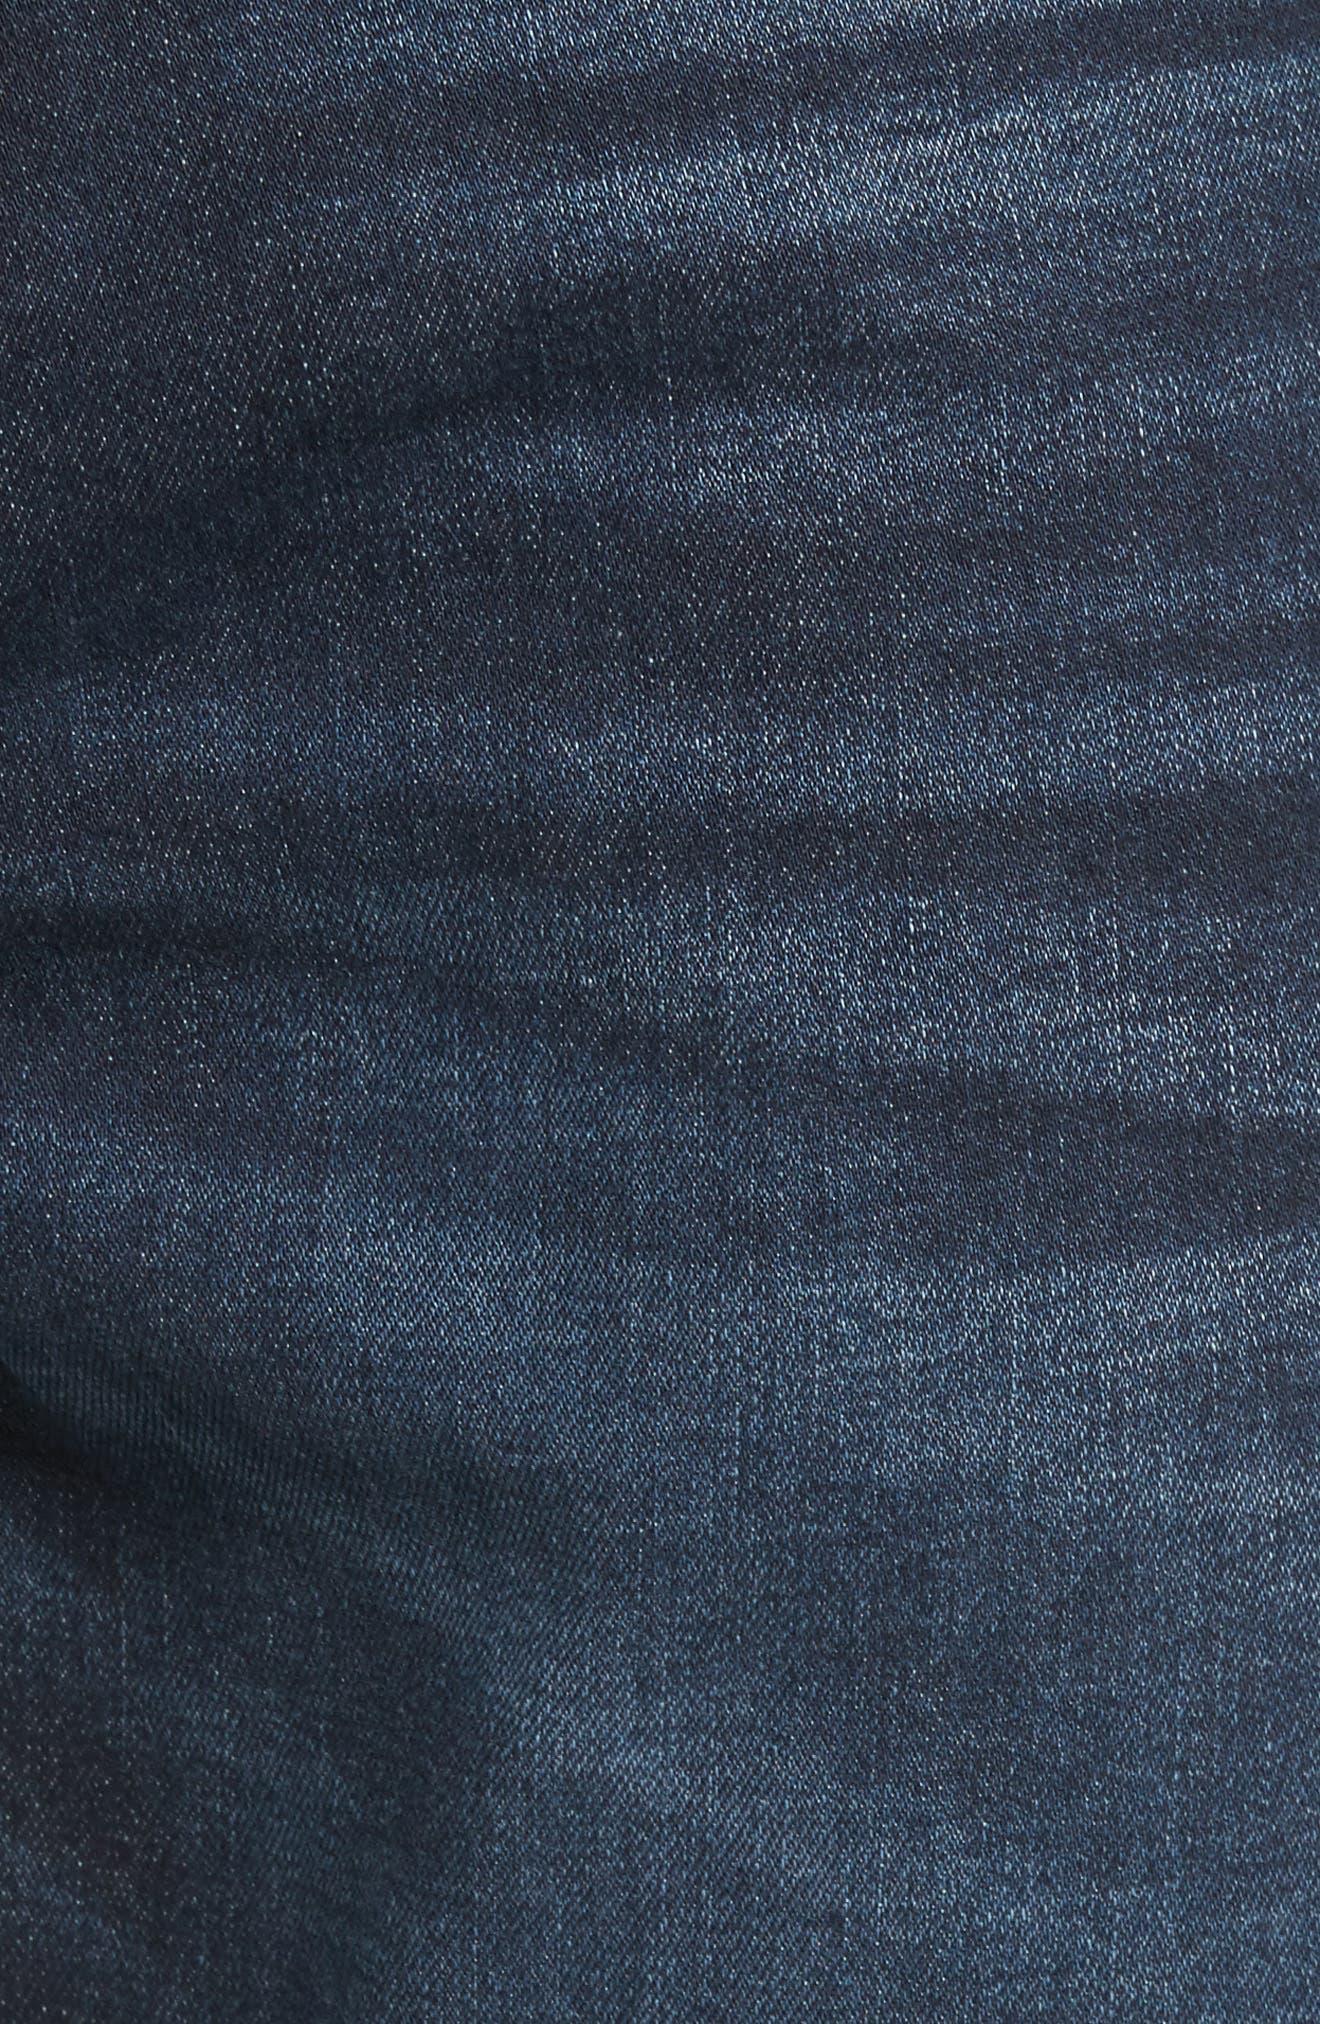 Slim Straight Leg Jeans,                             Alternate thumbnail 5, color,                             400